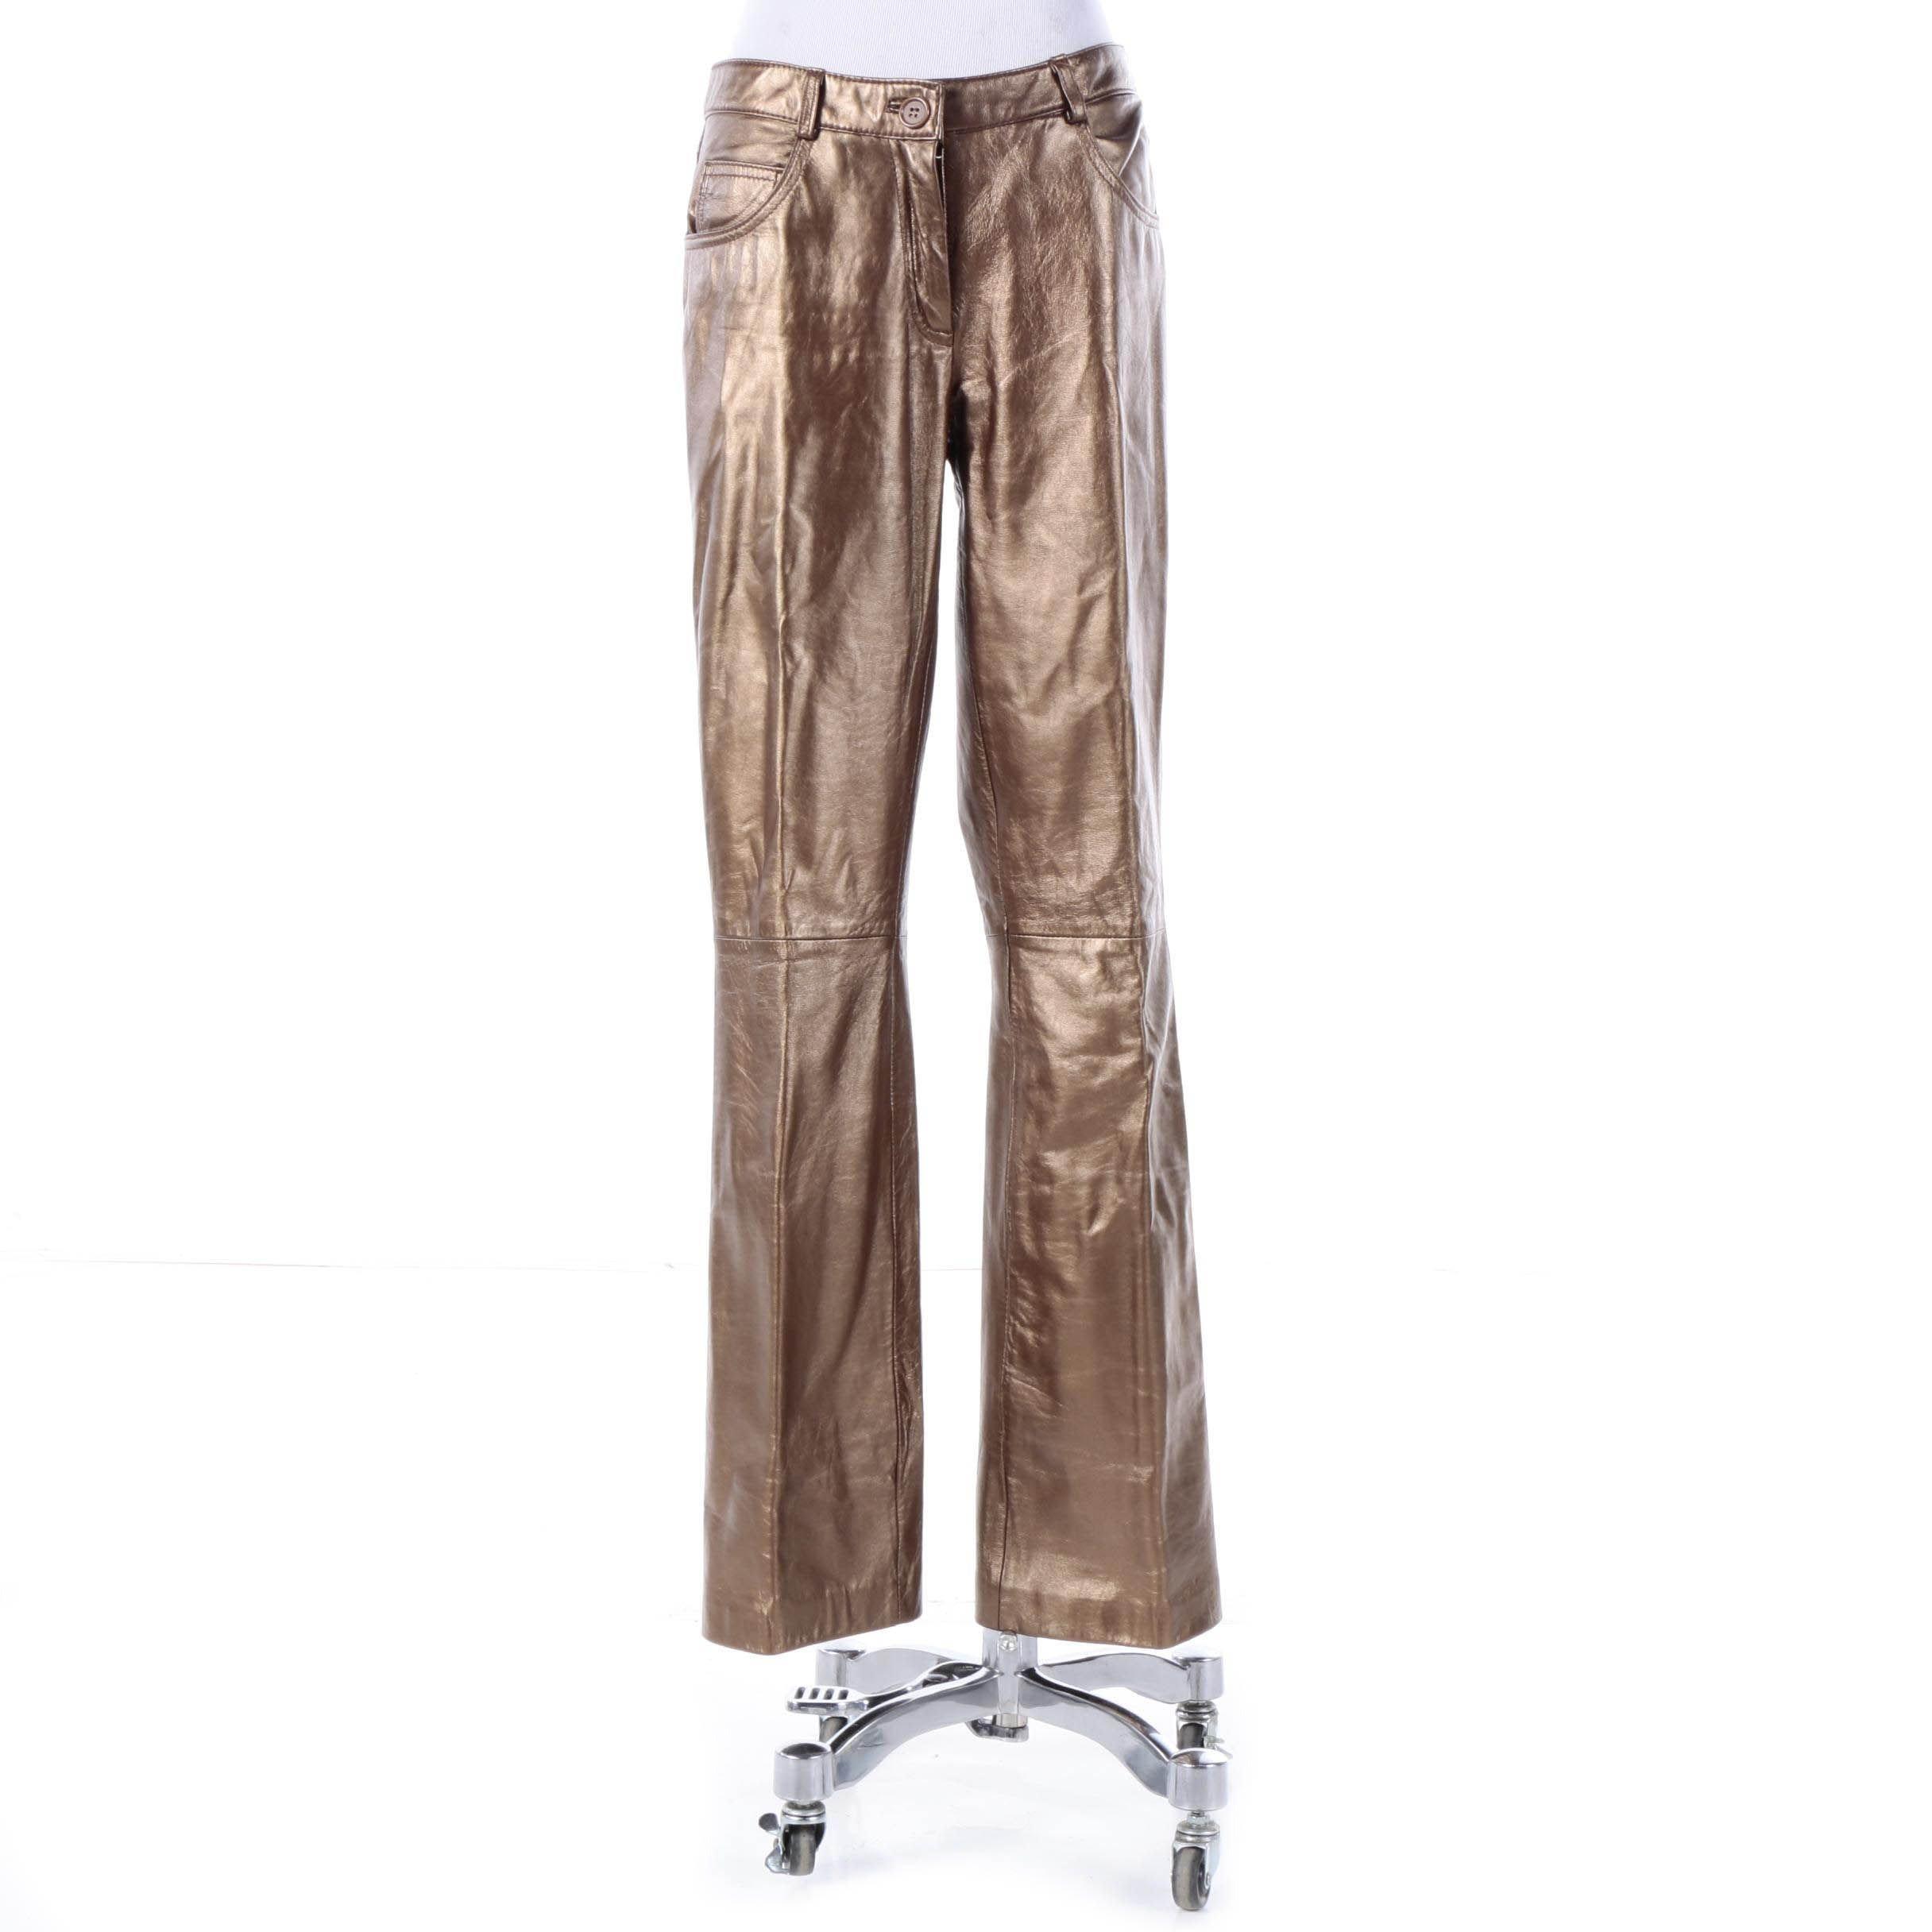 Sutton Studio Copper Tone Lambskin Leather Pants